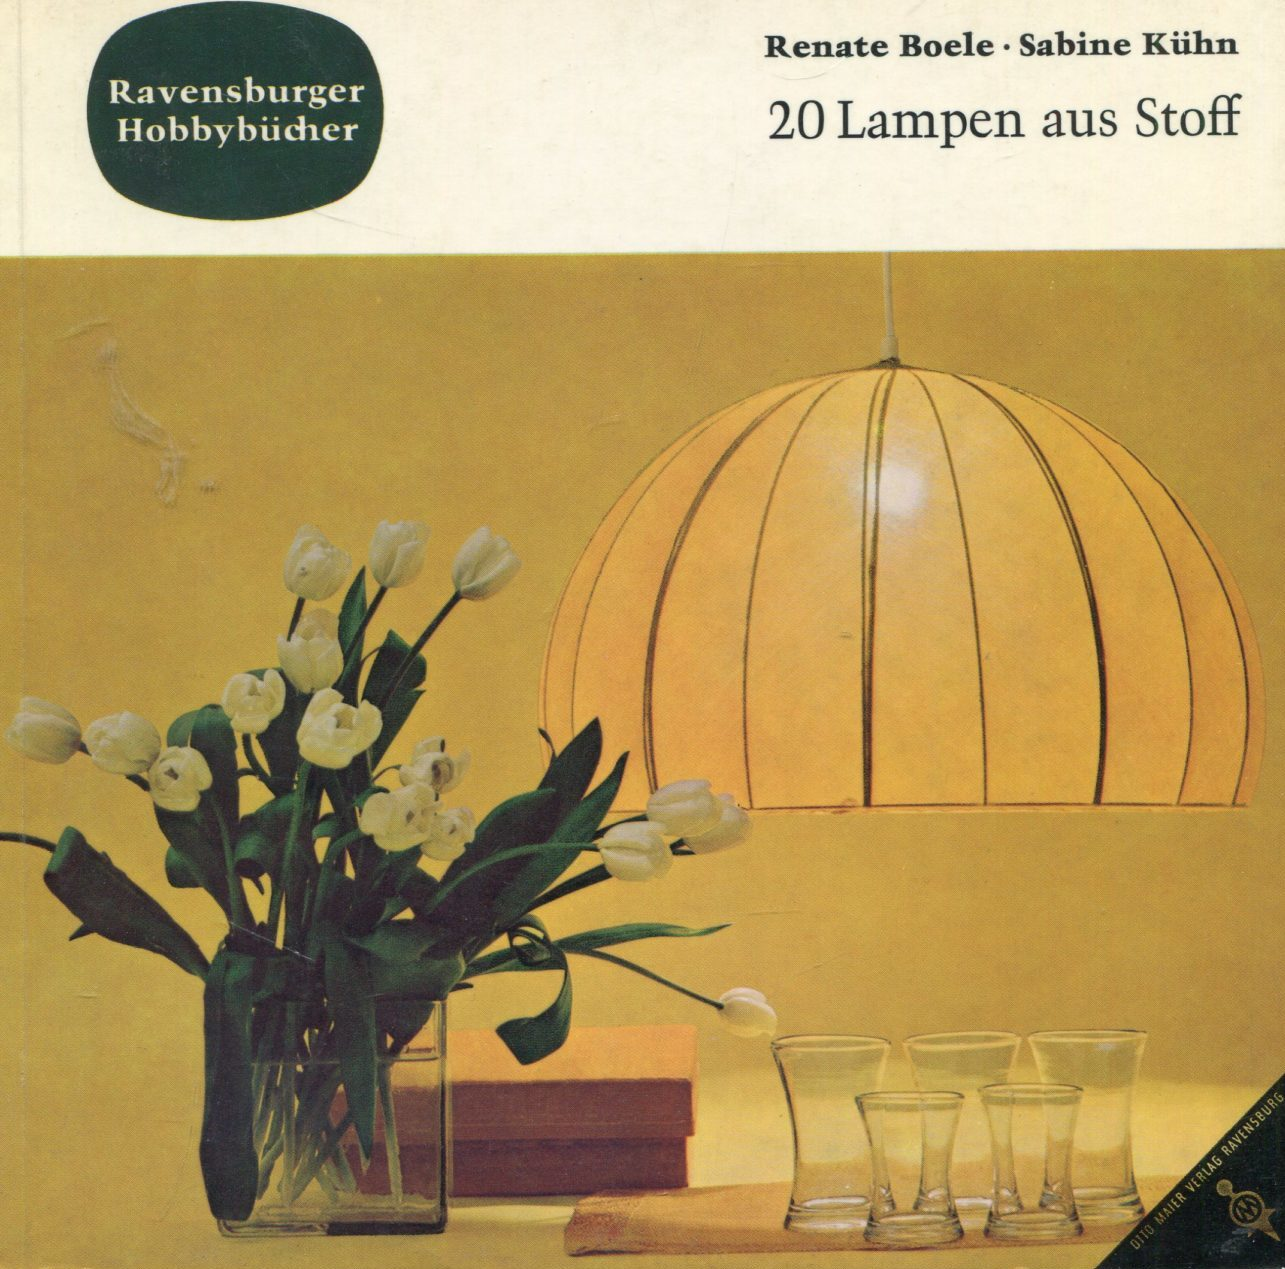 20 Lampen Aus Stoff Renate Boele, Sabine Kuhn